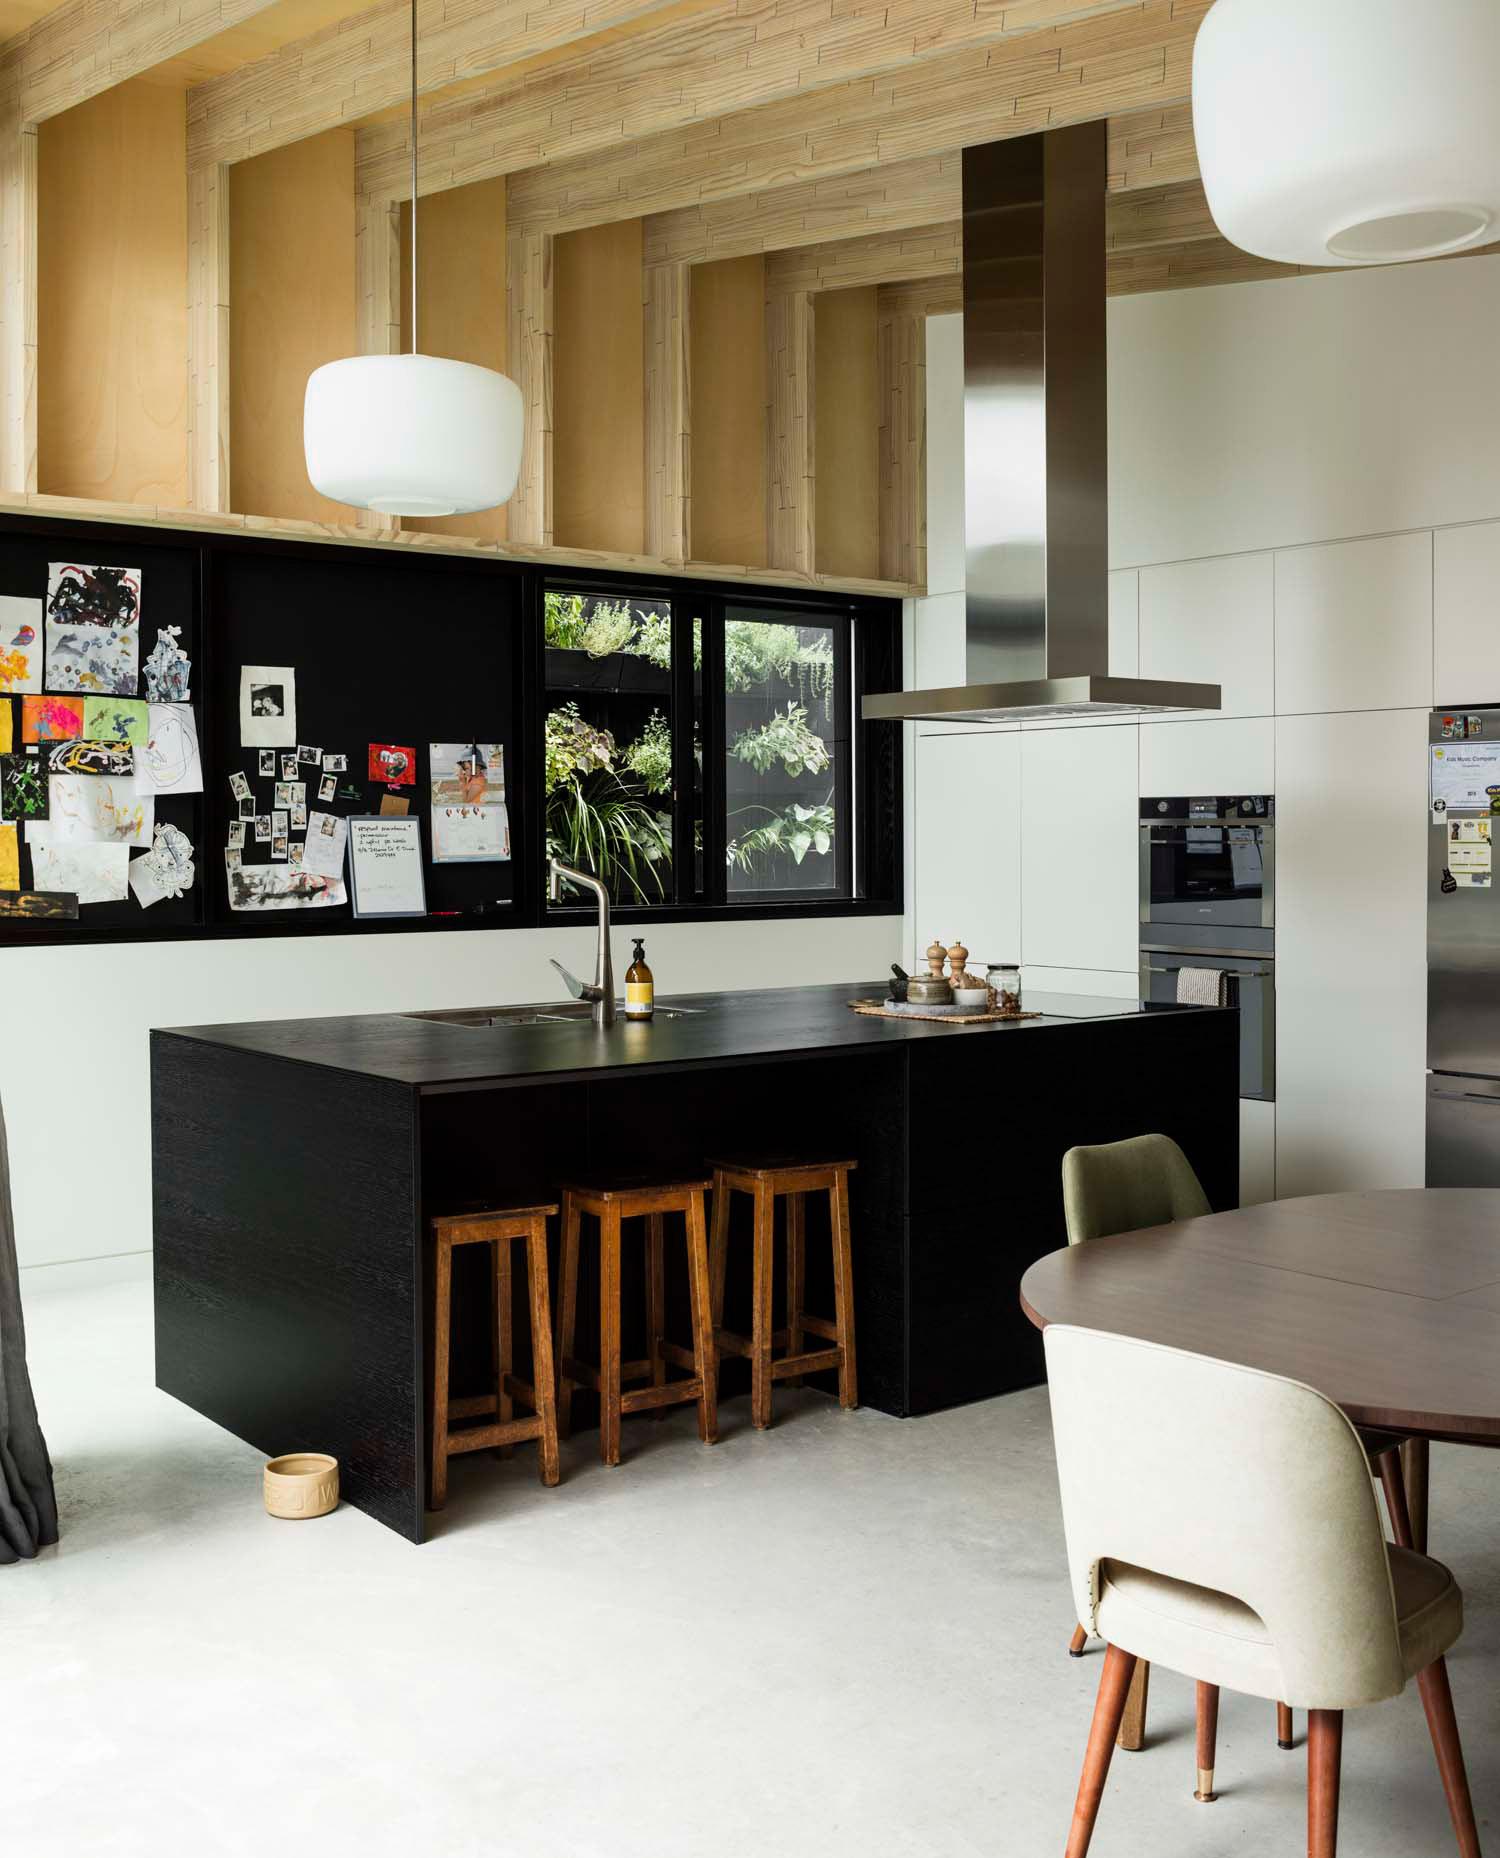 Dominic Glamuzina suburban house kitchen-dining share large space off internal courtyard